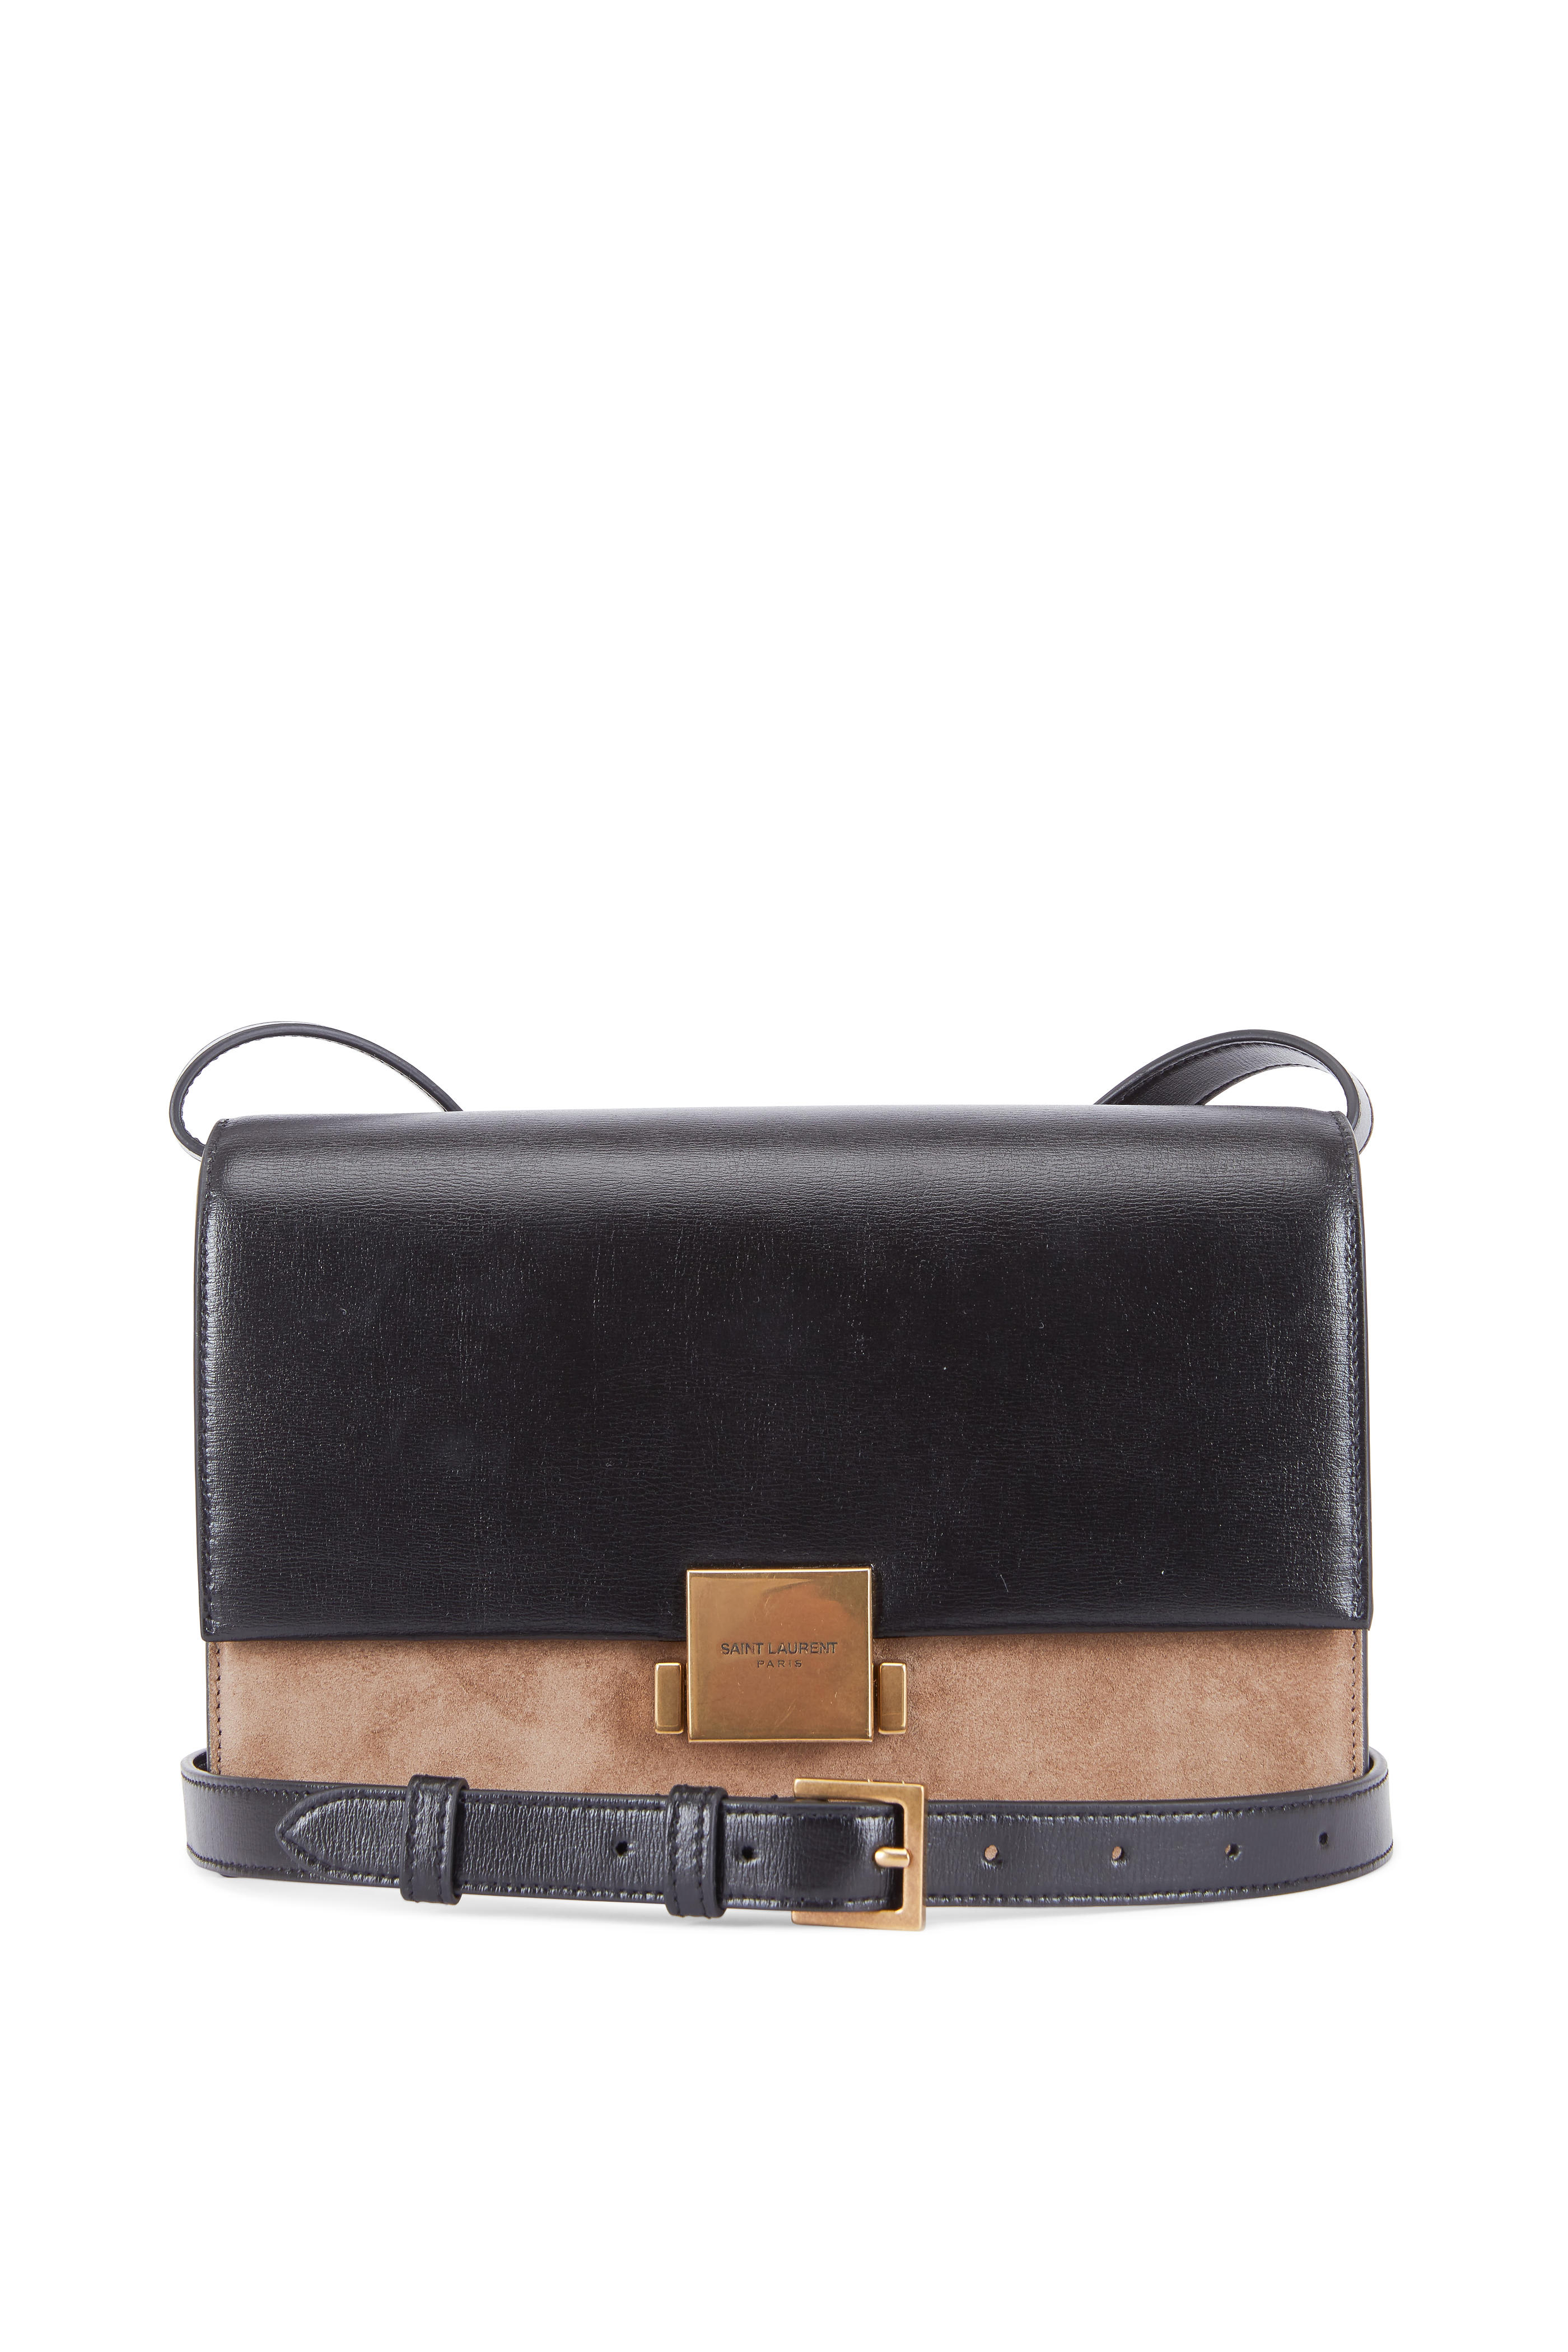 cf0172df5 Saint Laurent - Bellechasse Black Leather & Taupe Suede Satchel ...